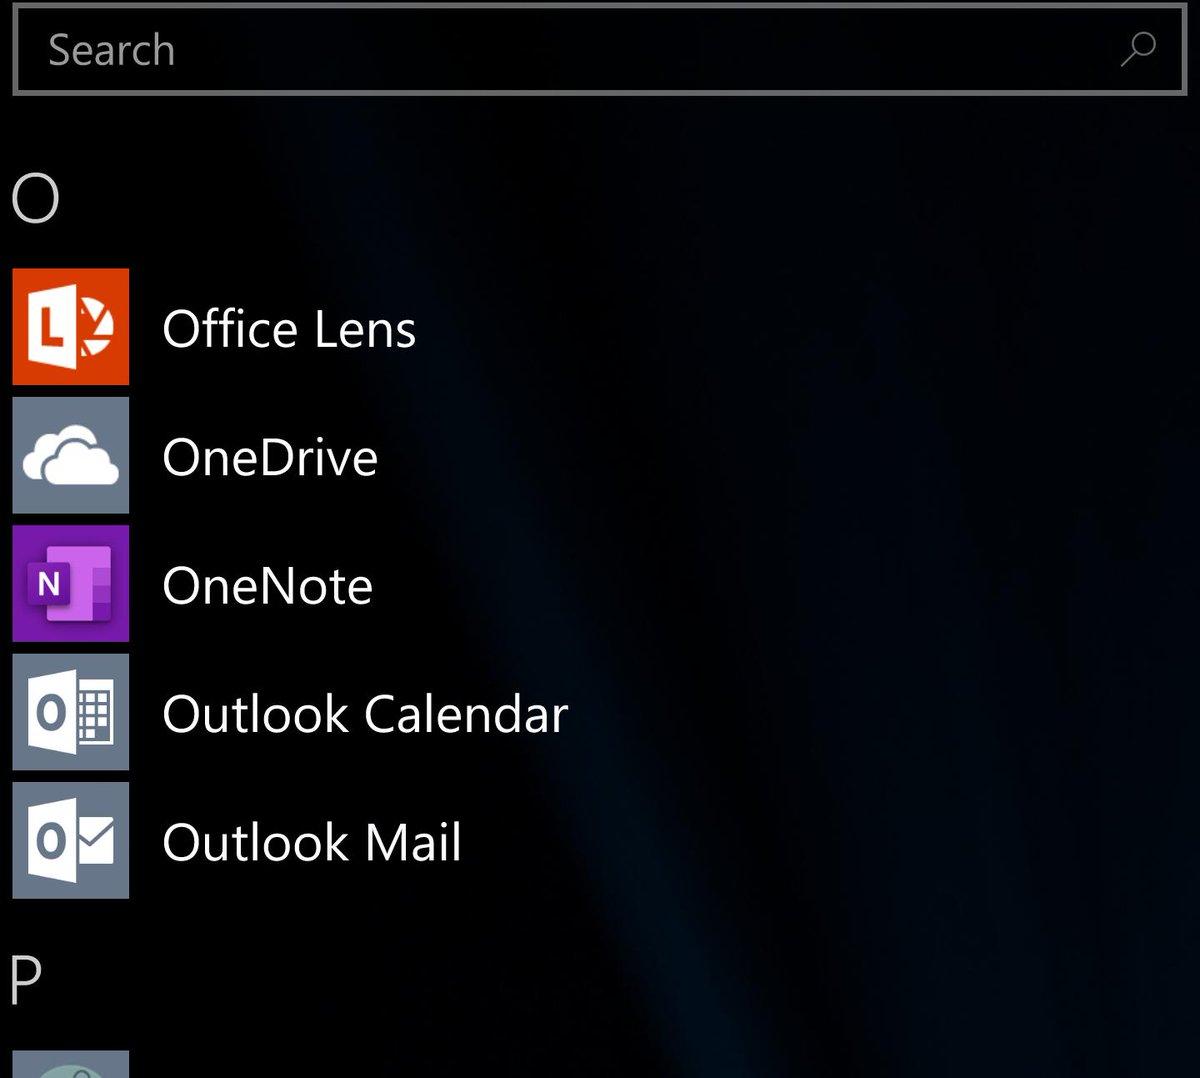 Omg new onenote icon on #Windows10Mobile #w10m #hpelitex3